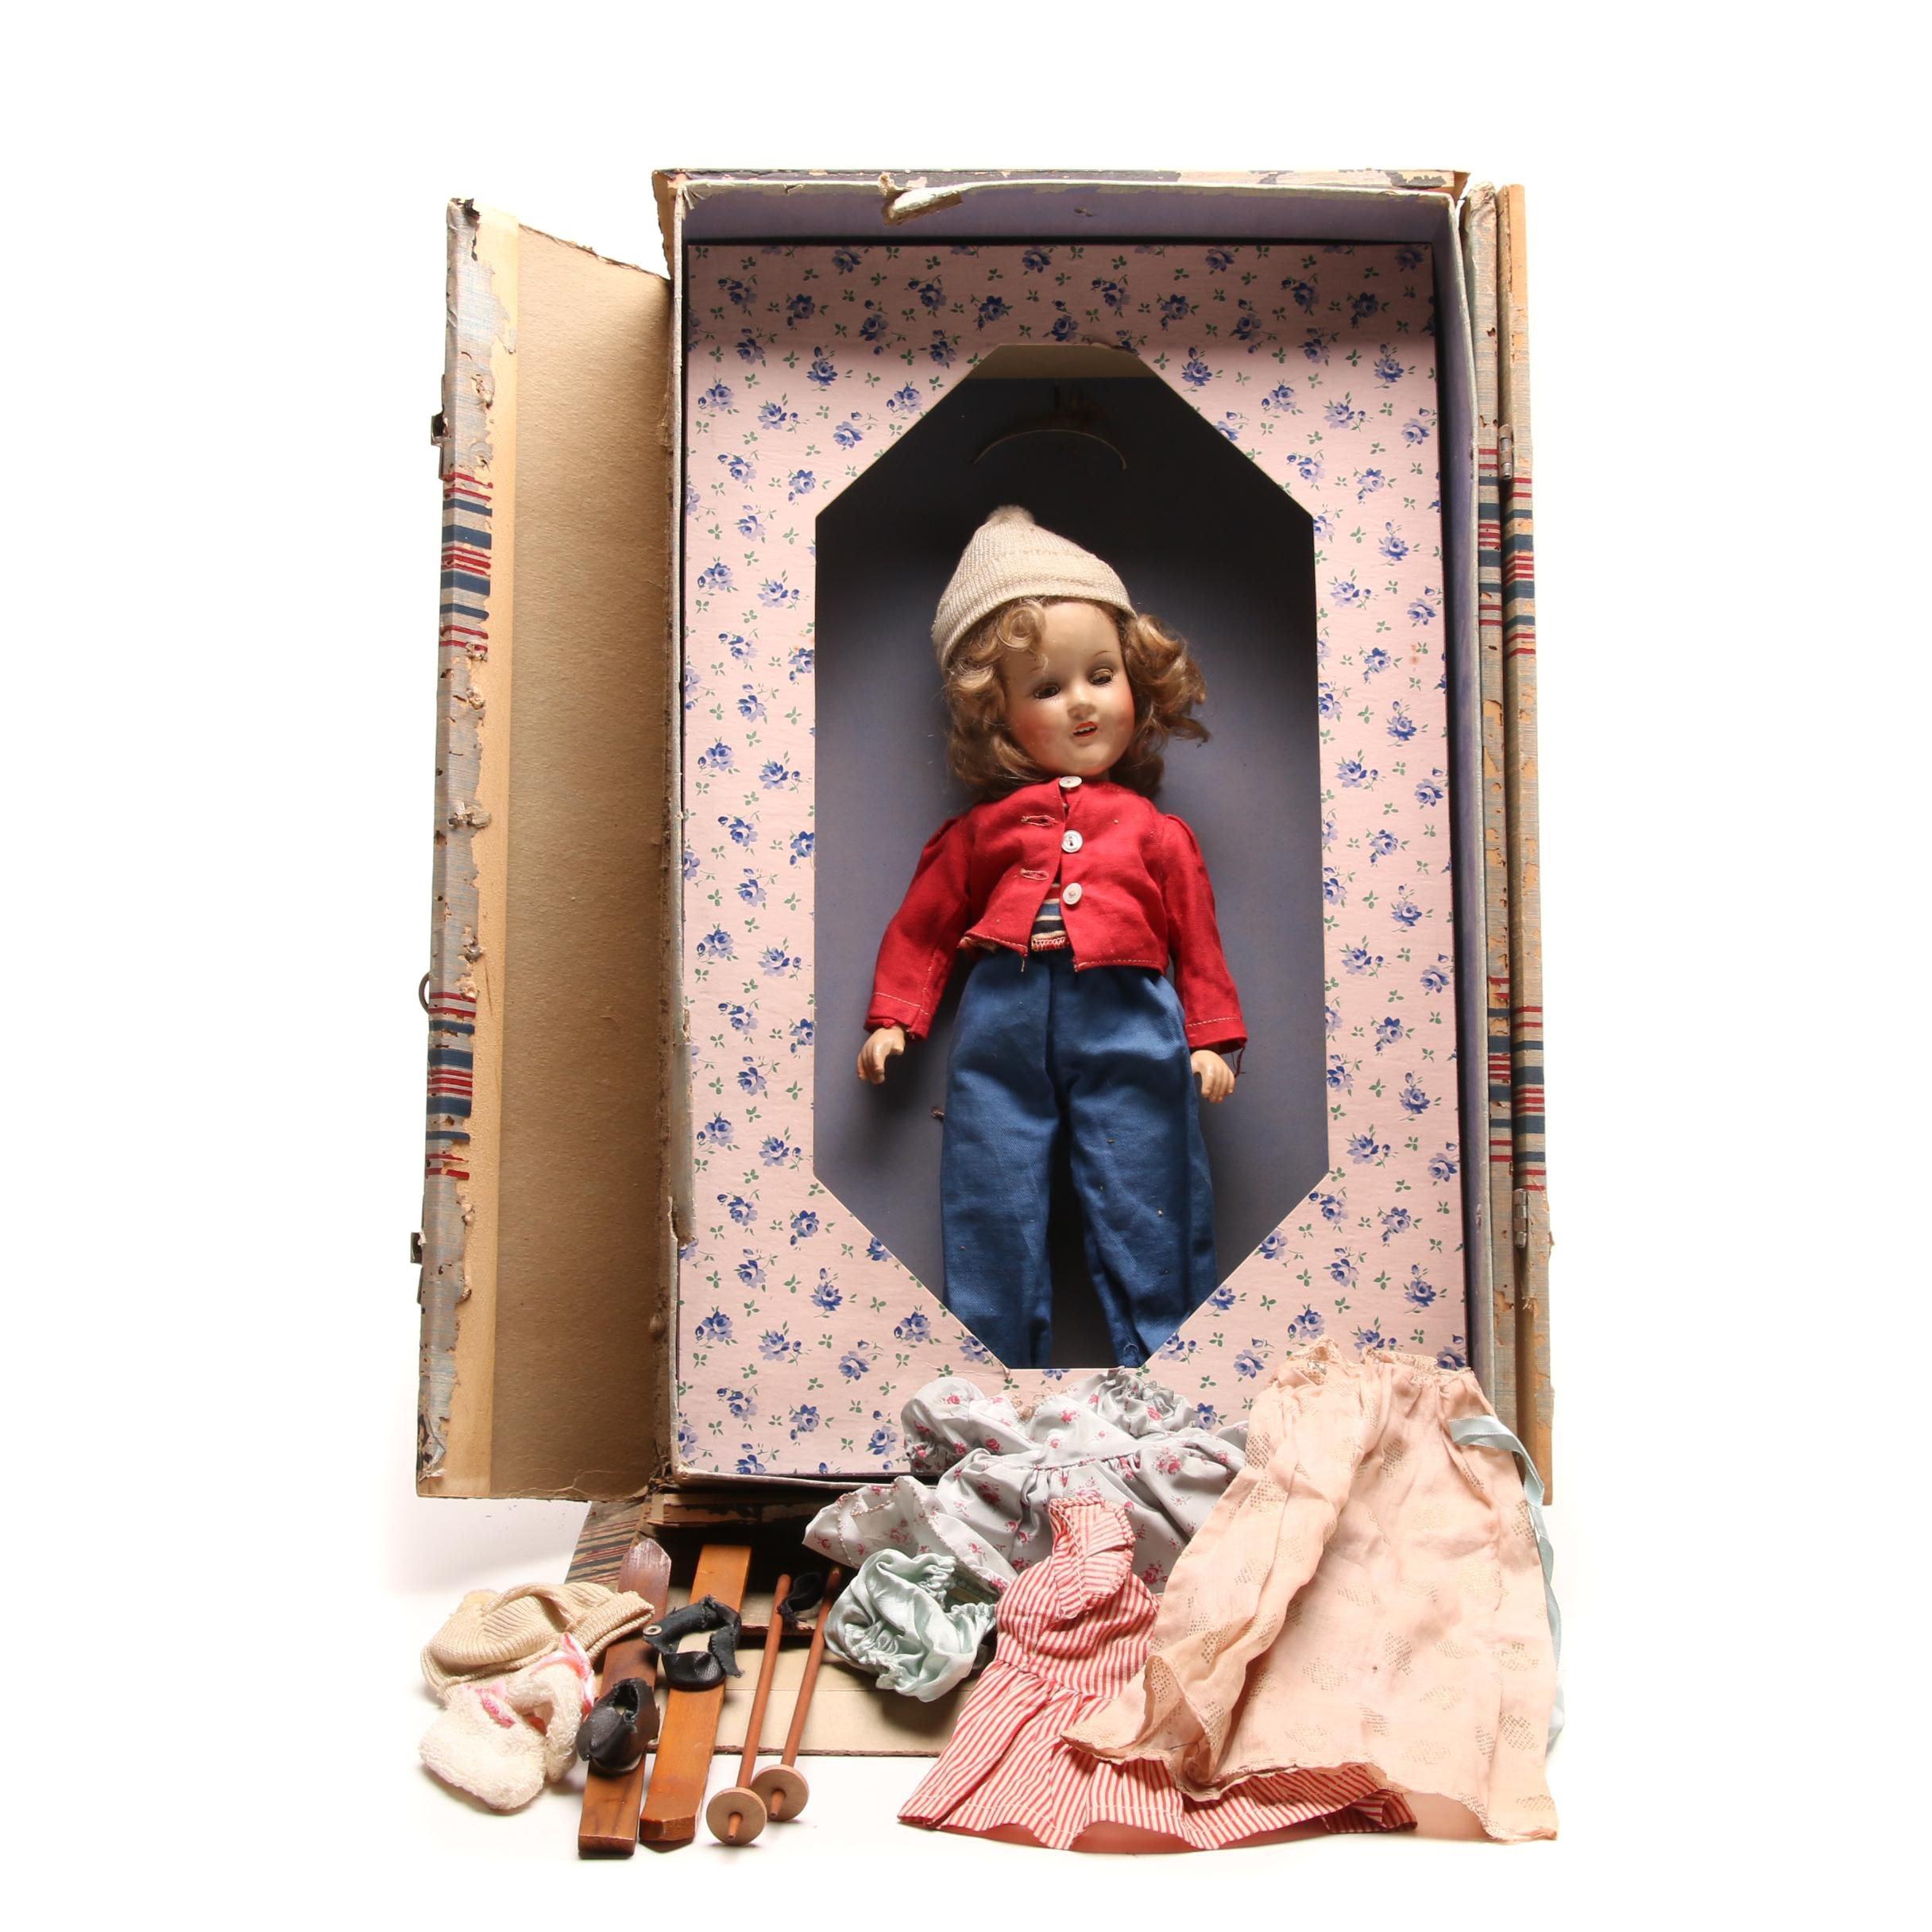 Vintage Sonja Henie Style Composition Doll